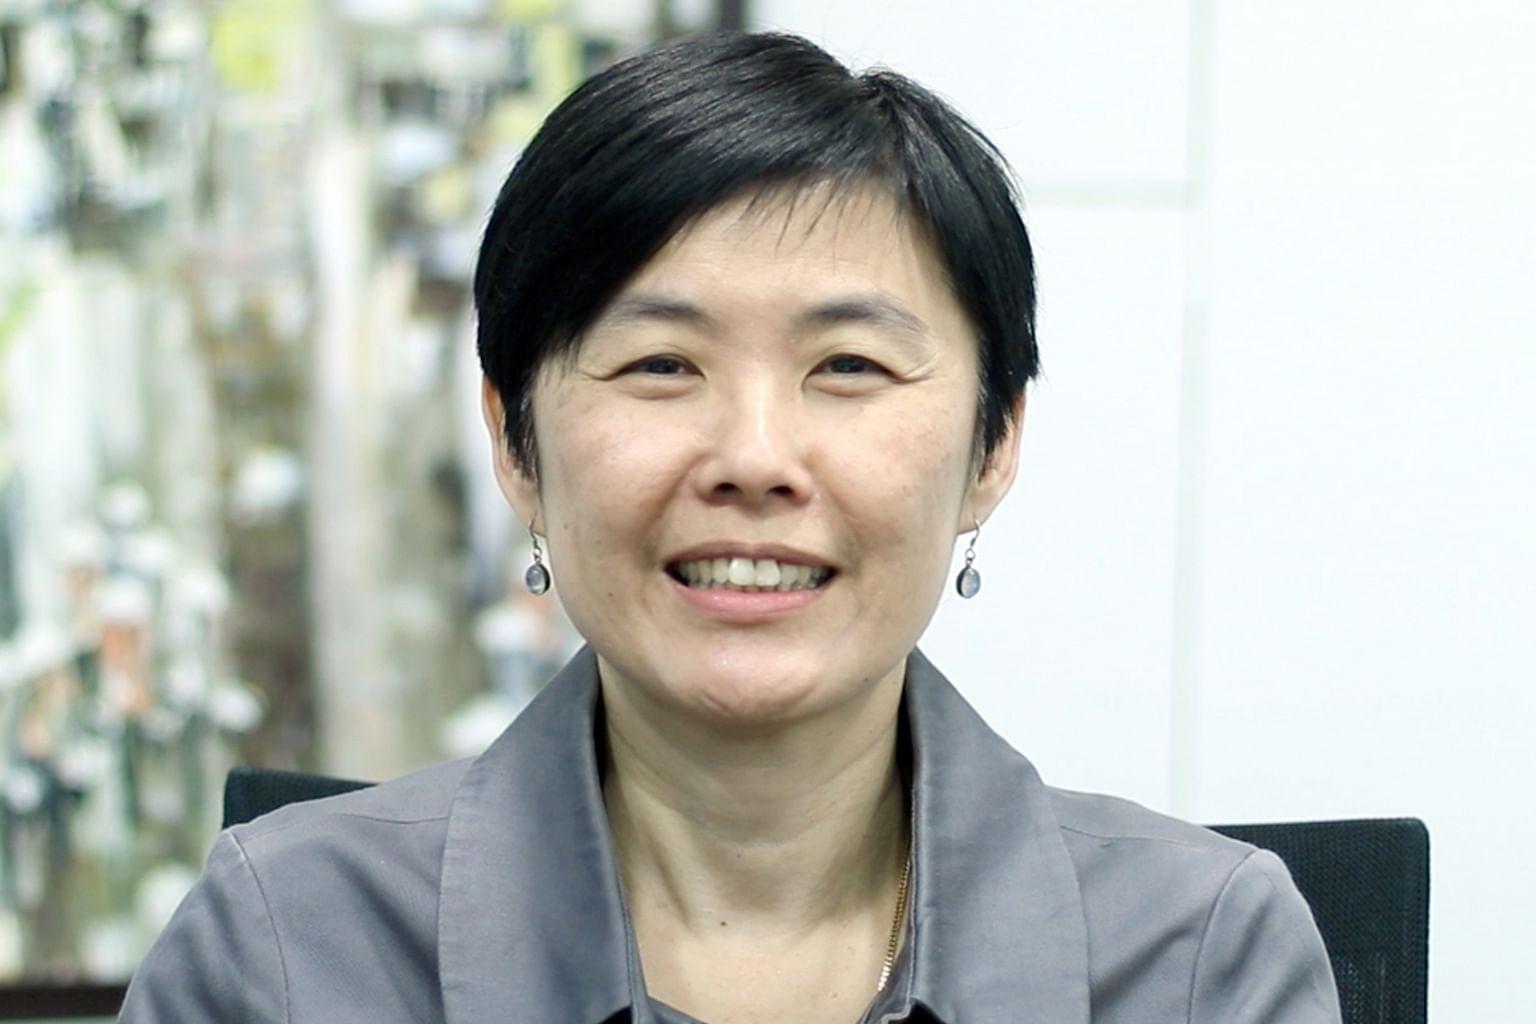 Gary ng singapore scandal choa chu kang girl 2